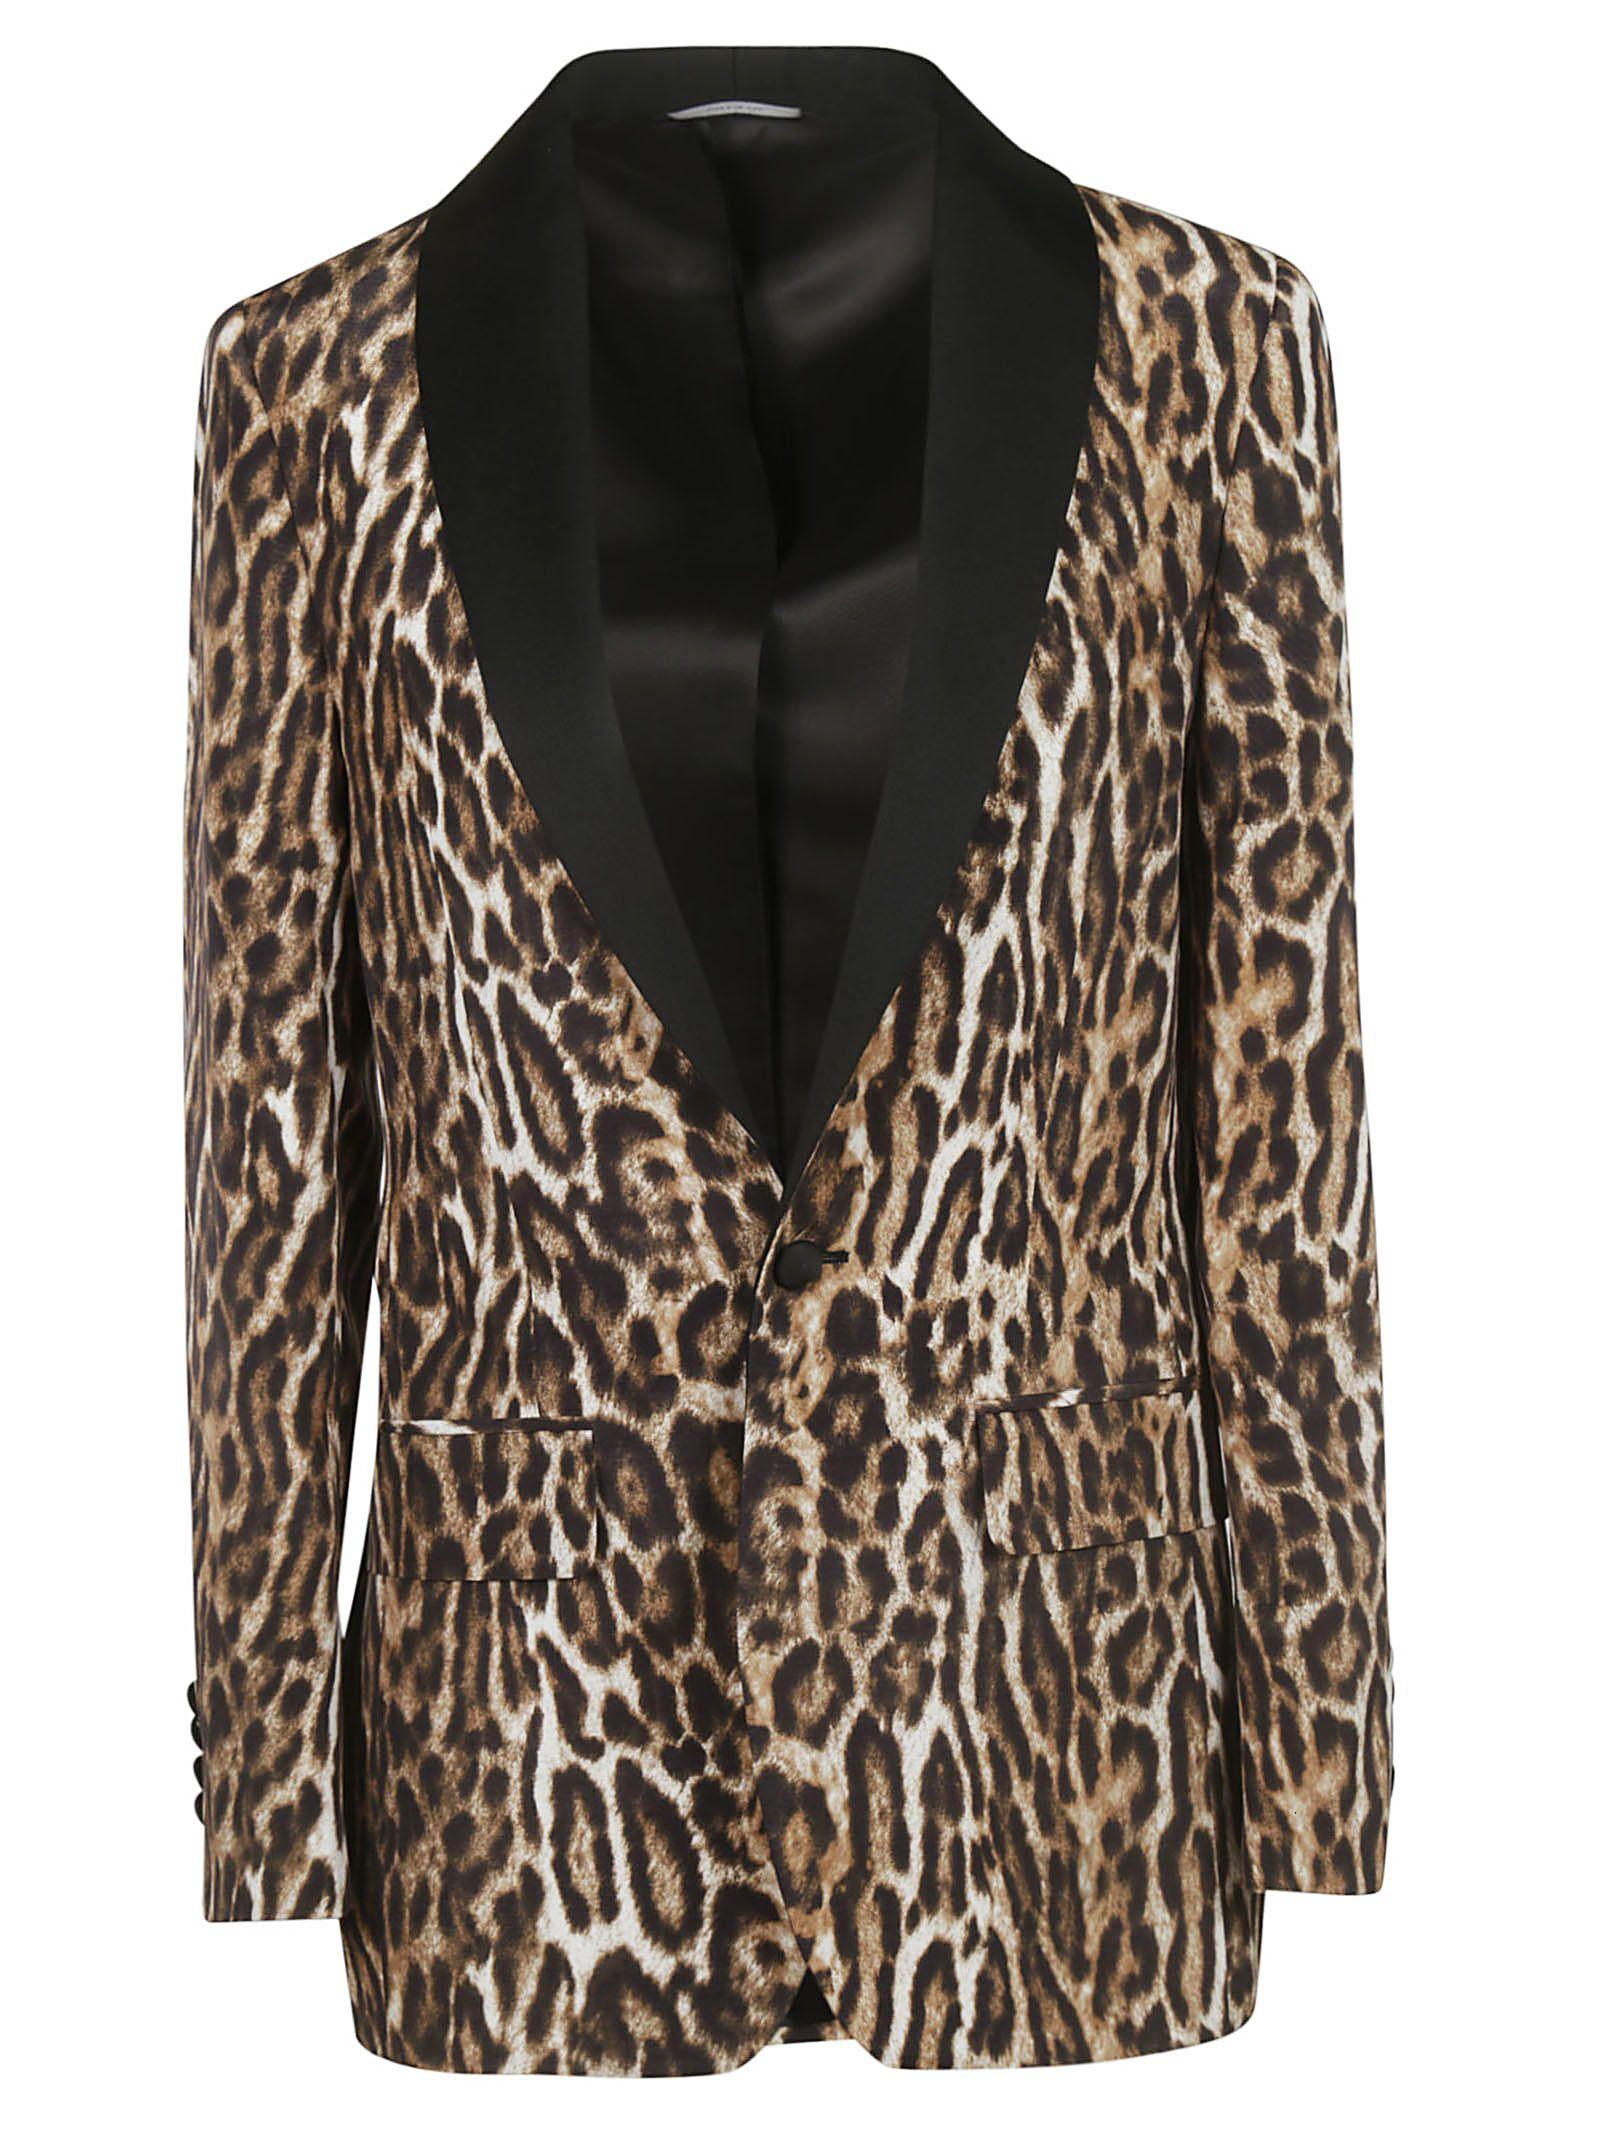 eafe3dfcd0bb R13 R13 Leopard Print Blazer - Brown/White/Black - 10931505   italist